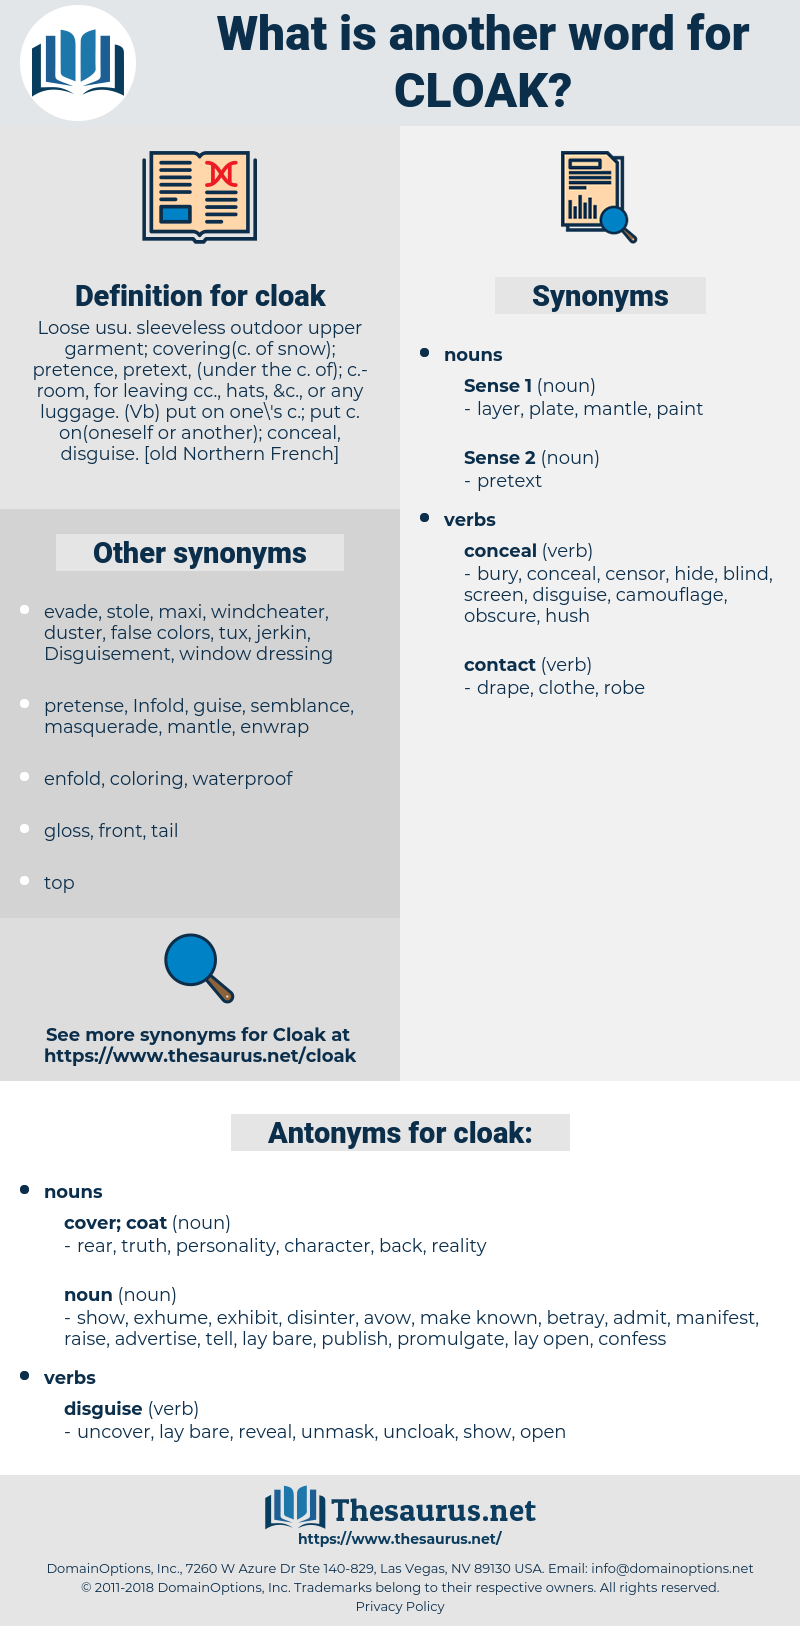 cloak, synonym cloak, another word for cloak, words like cloak, thesaurus cloak